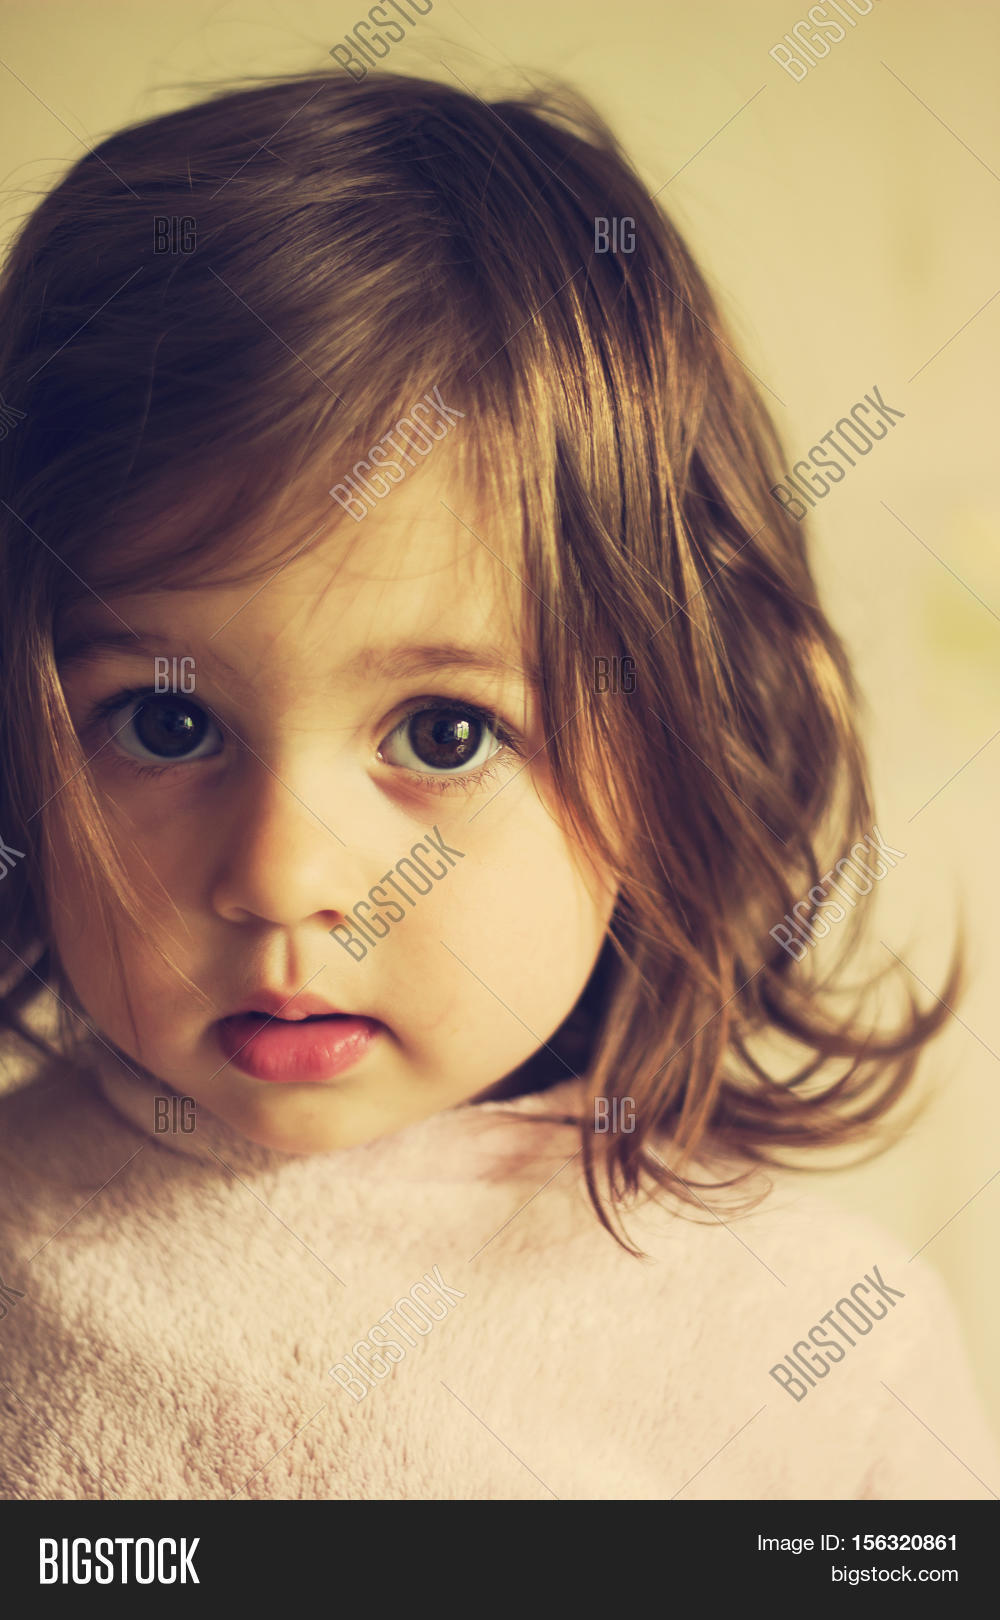 Sad Baby Girl Photo : photo, Little, Image, Photo, (Free, Trial), Bigstock